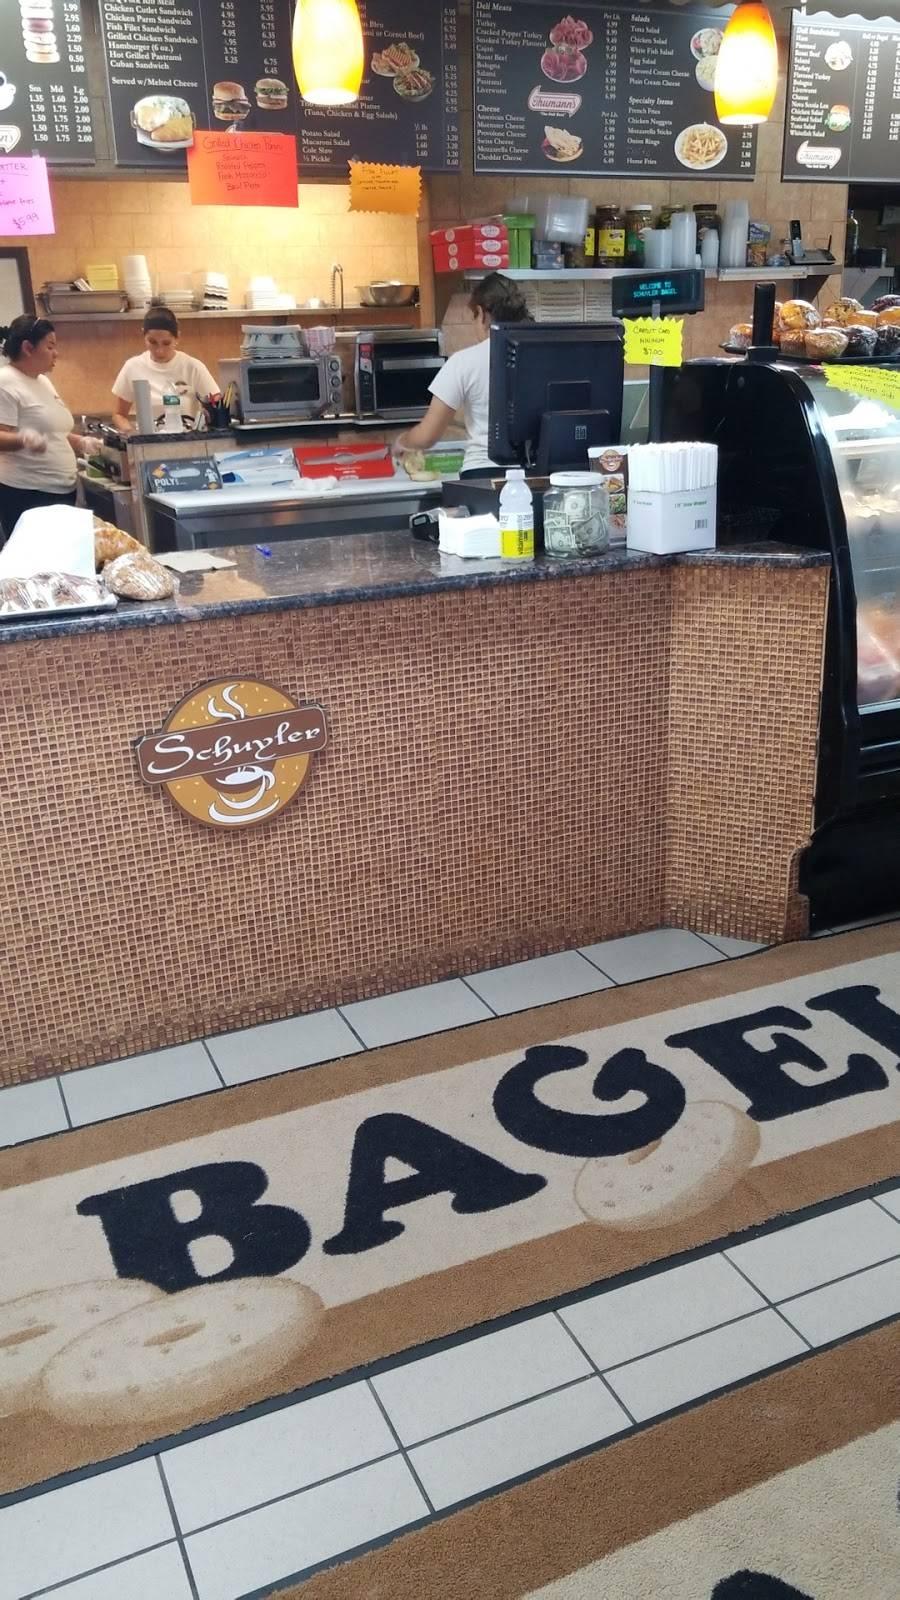 Schuyler Bagels | restaurant | 170 Schuyler Ave, North Arlington, NJ 07031, USA | 2019910017 OR +1 201-991-0017